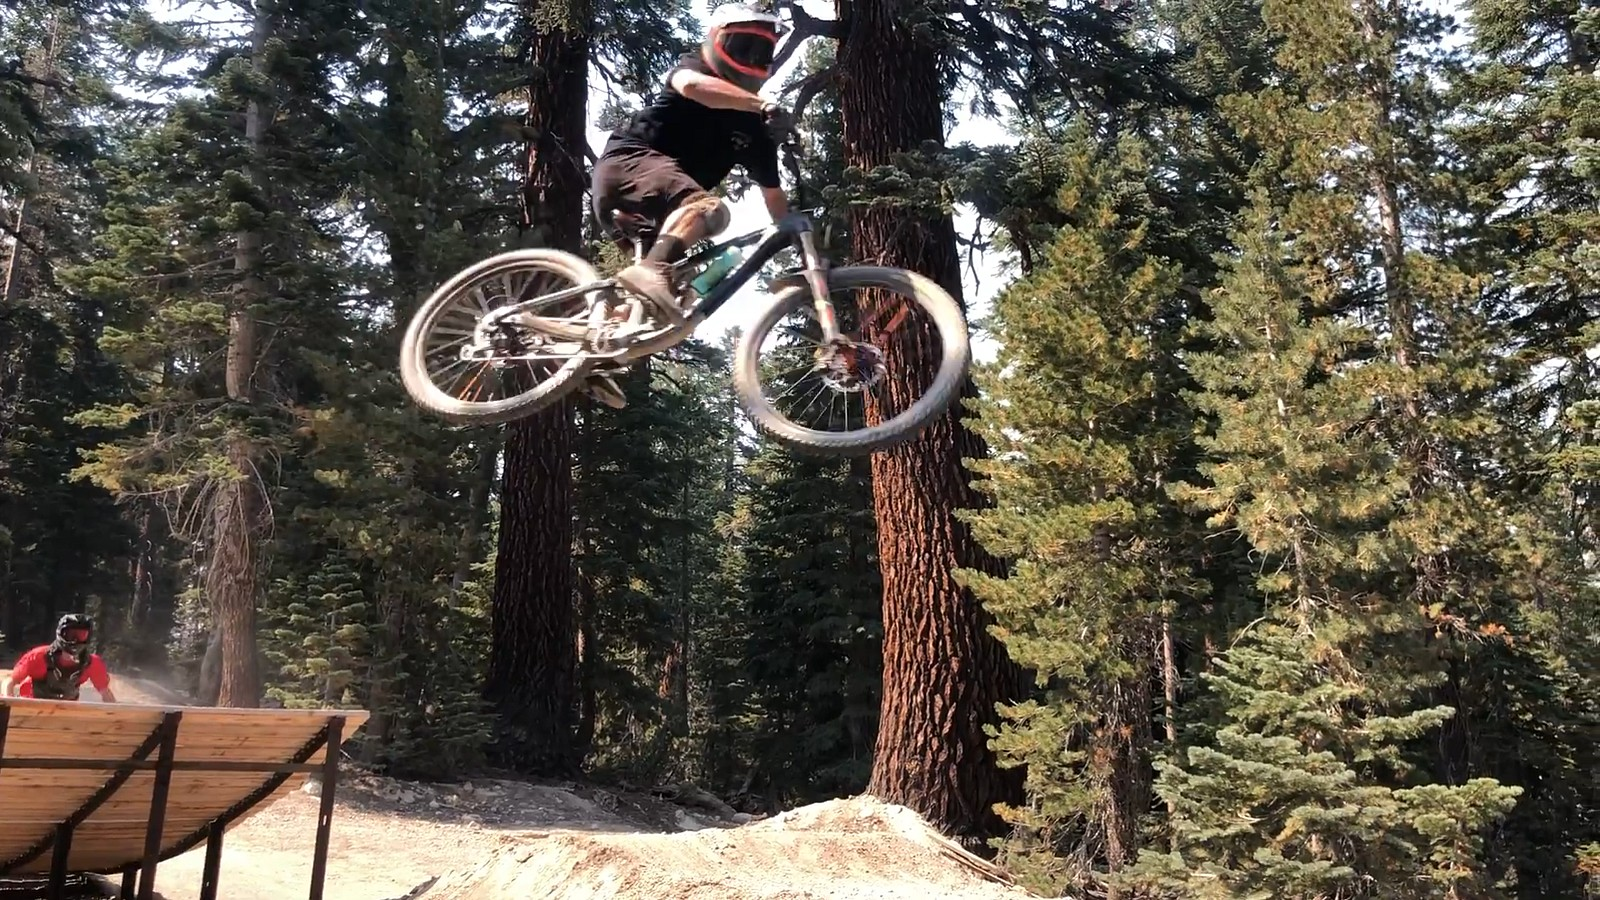 Mammo Twilight - switzb15 - Mountain Biking Pictures - Vital MTB